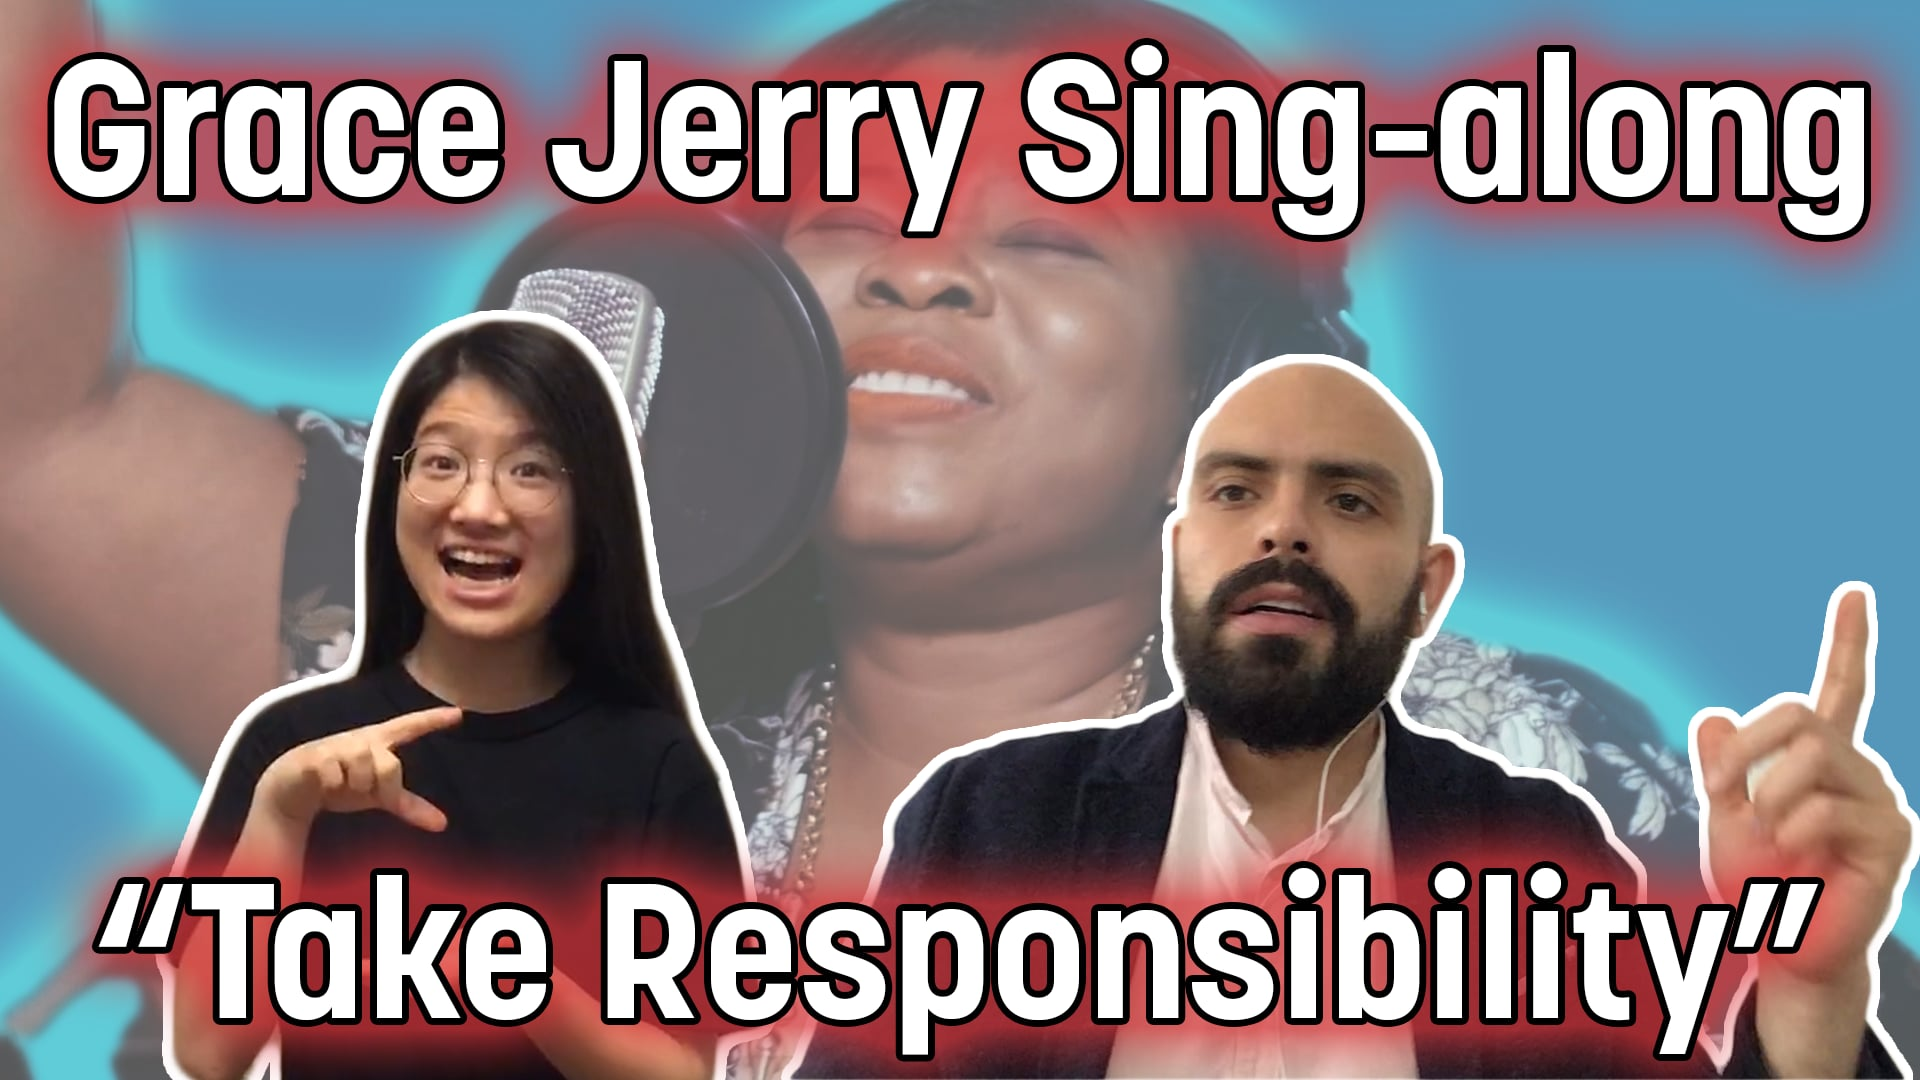 """Take Responsibility"" by Grace Jerry Sing Along"